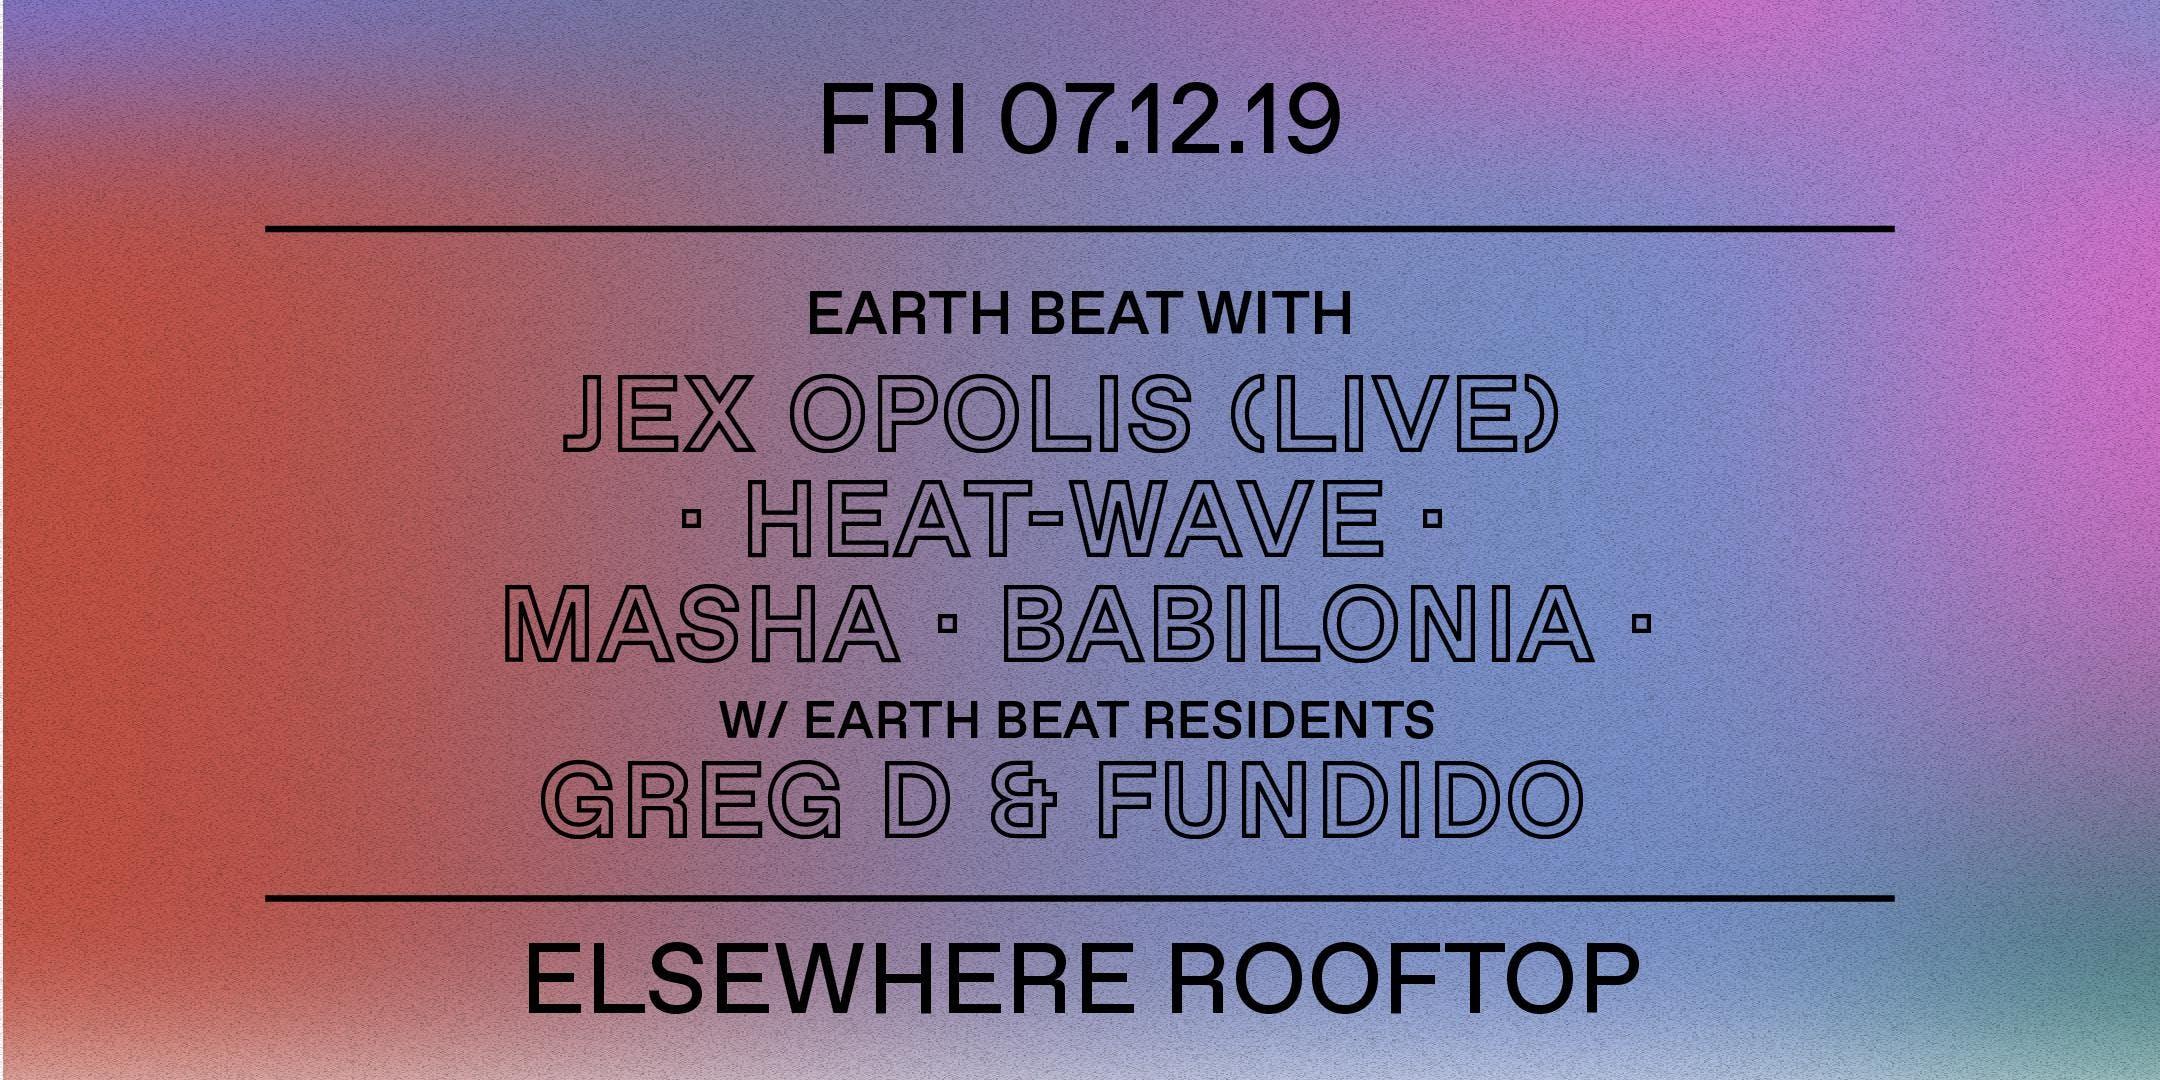 Earth Beat w/ Jex Opolis (Live), Heat-Wave, Masha, Babilonia, Greg D & Fundido